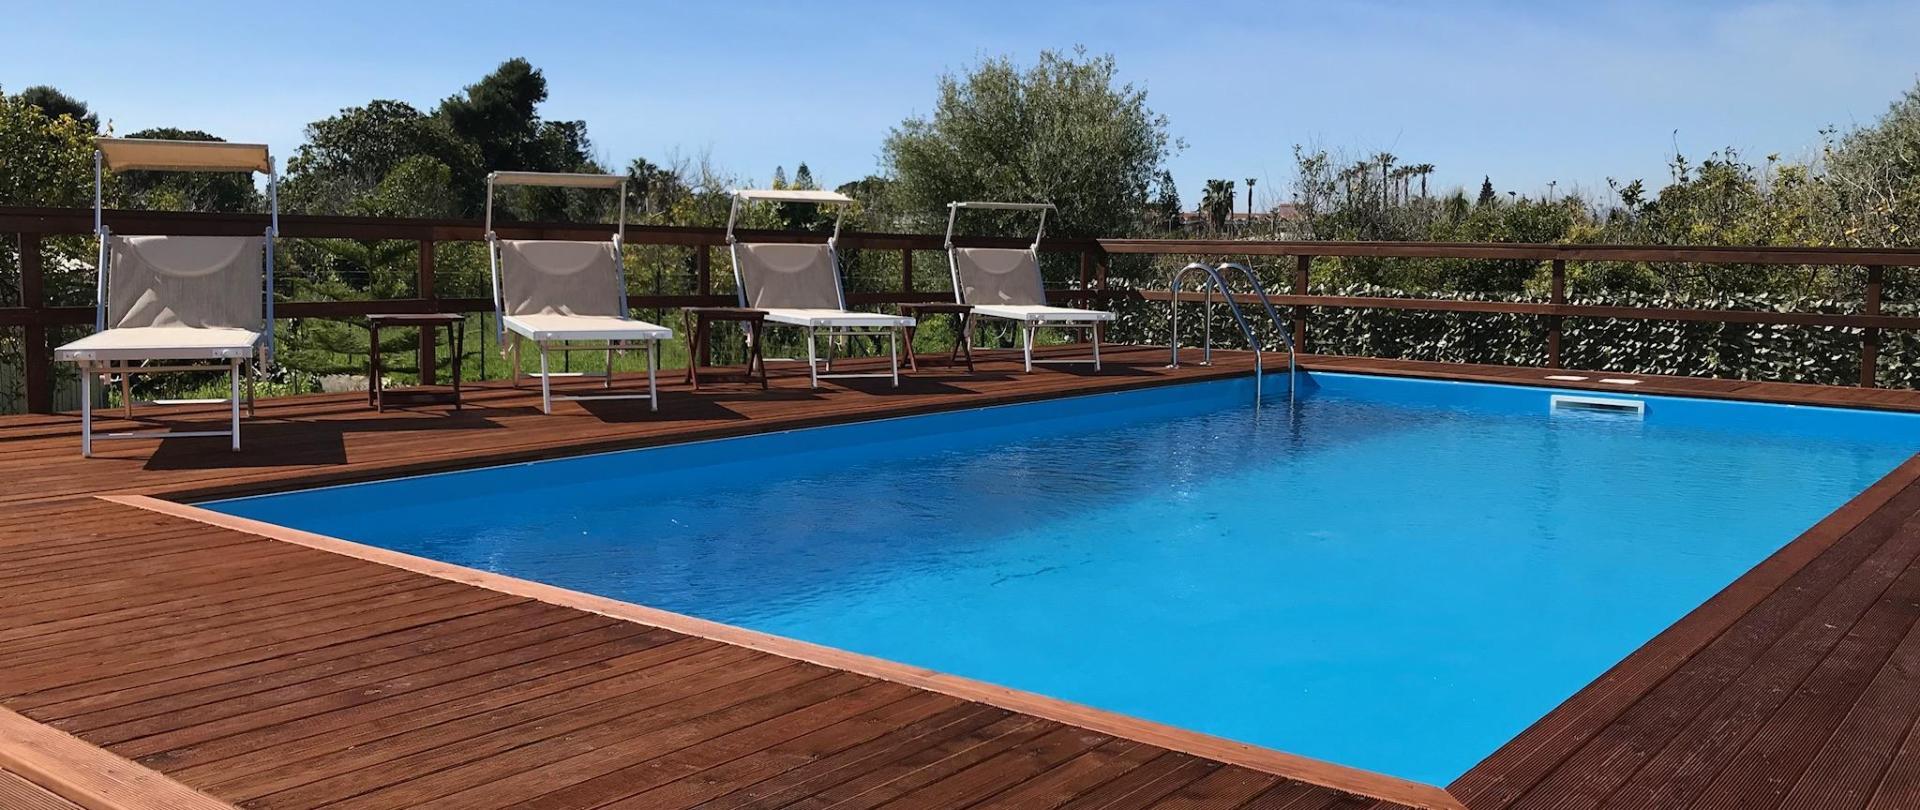 John Sea Suite - Giardini Naxos - Italy